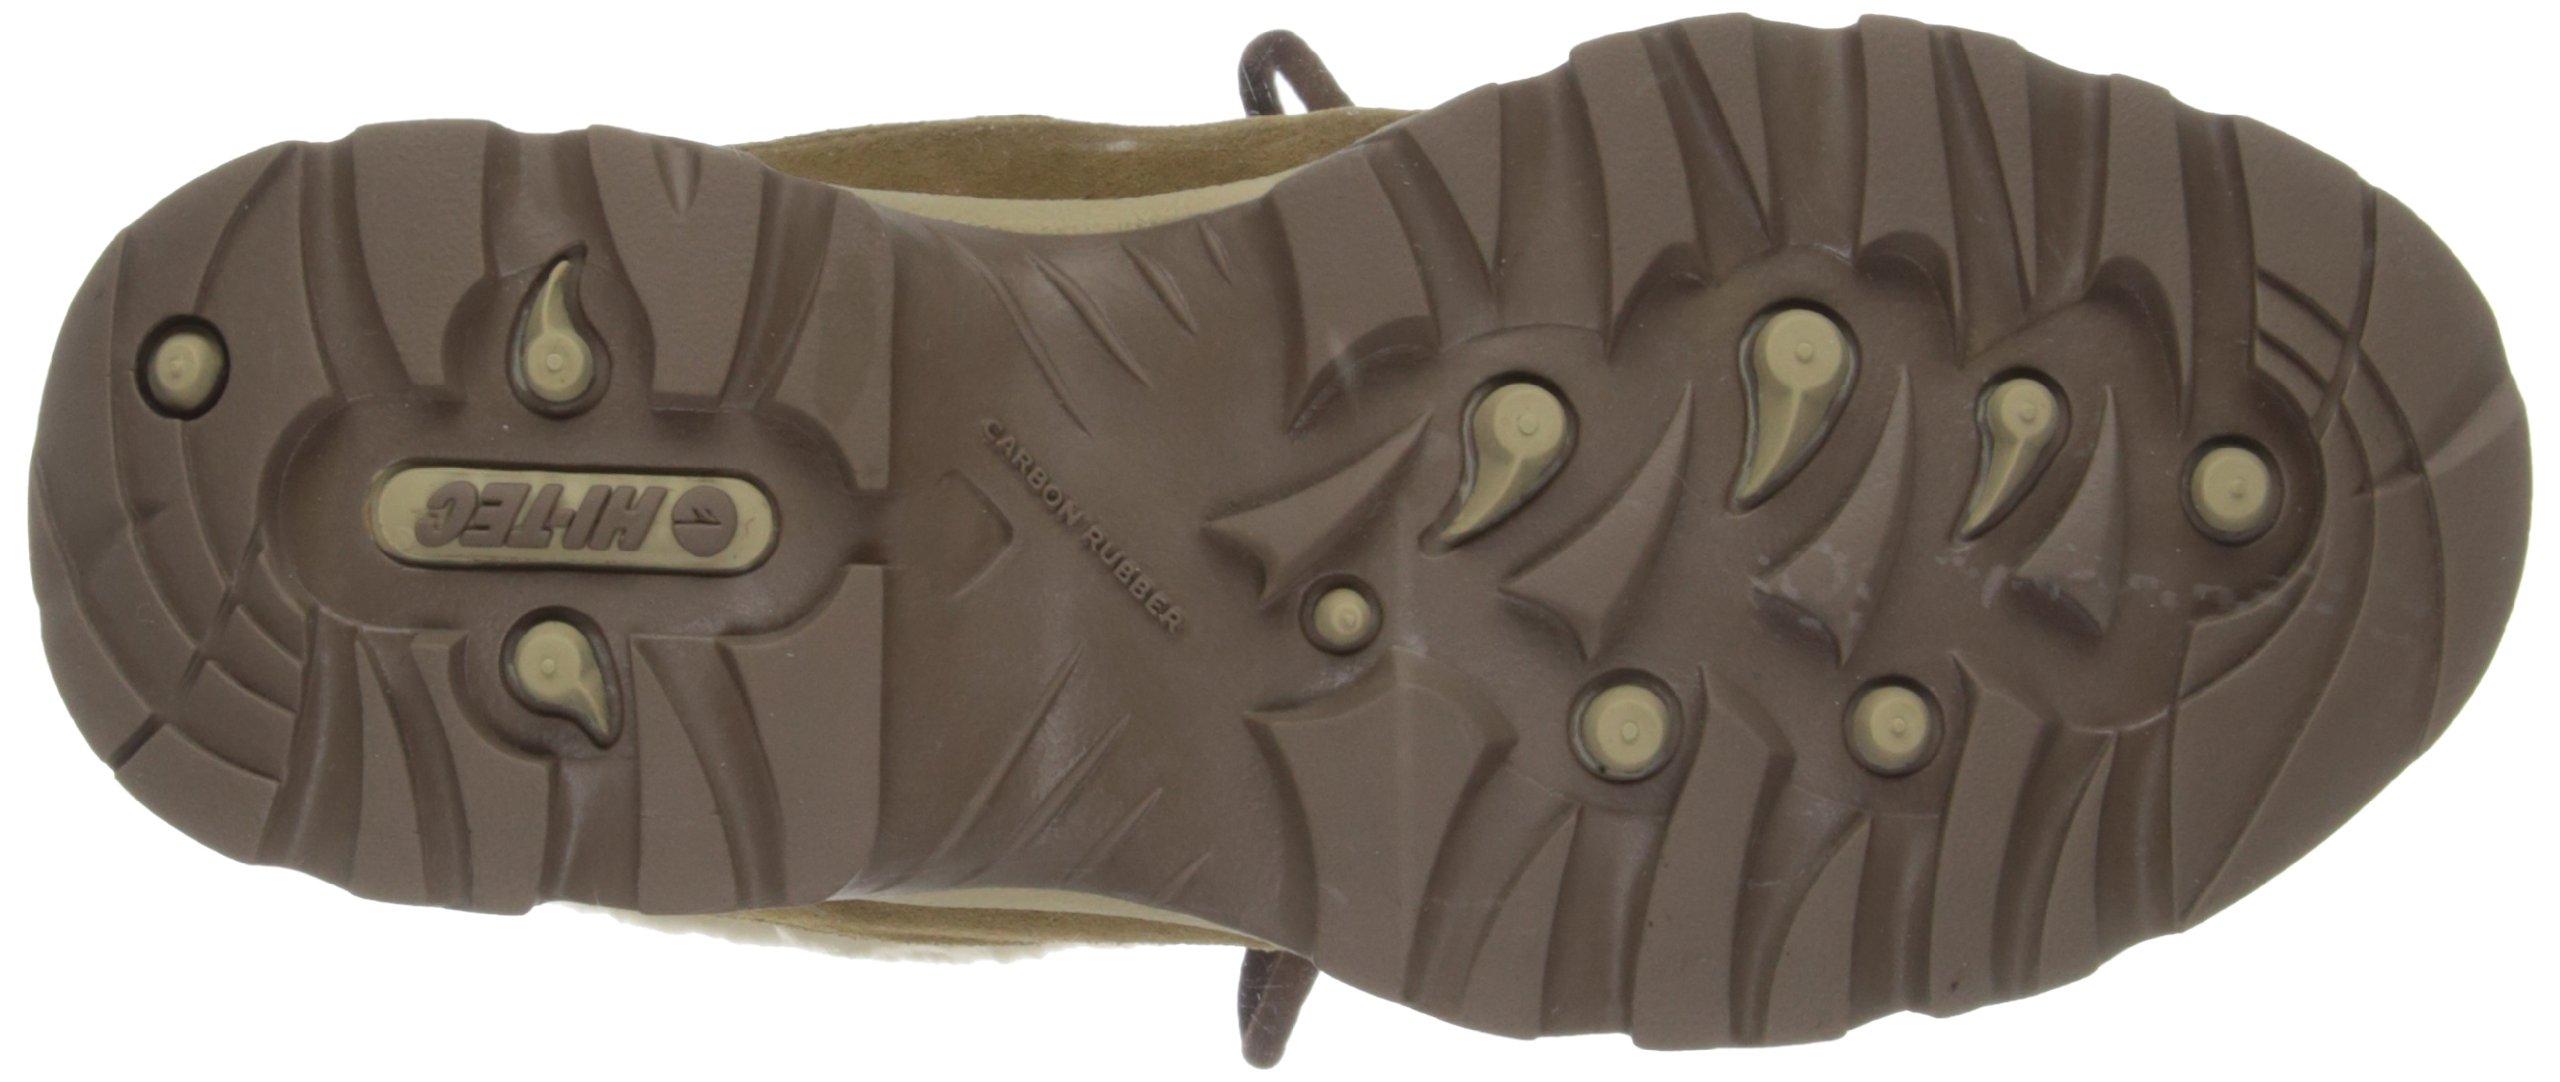 Hi-Tec ST Moritz, Women's Hiking Boots 3